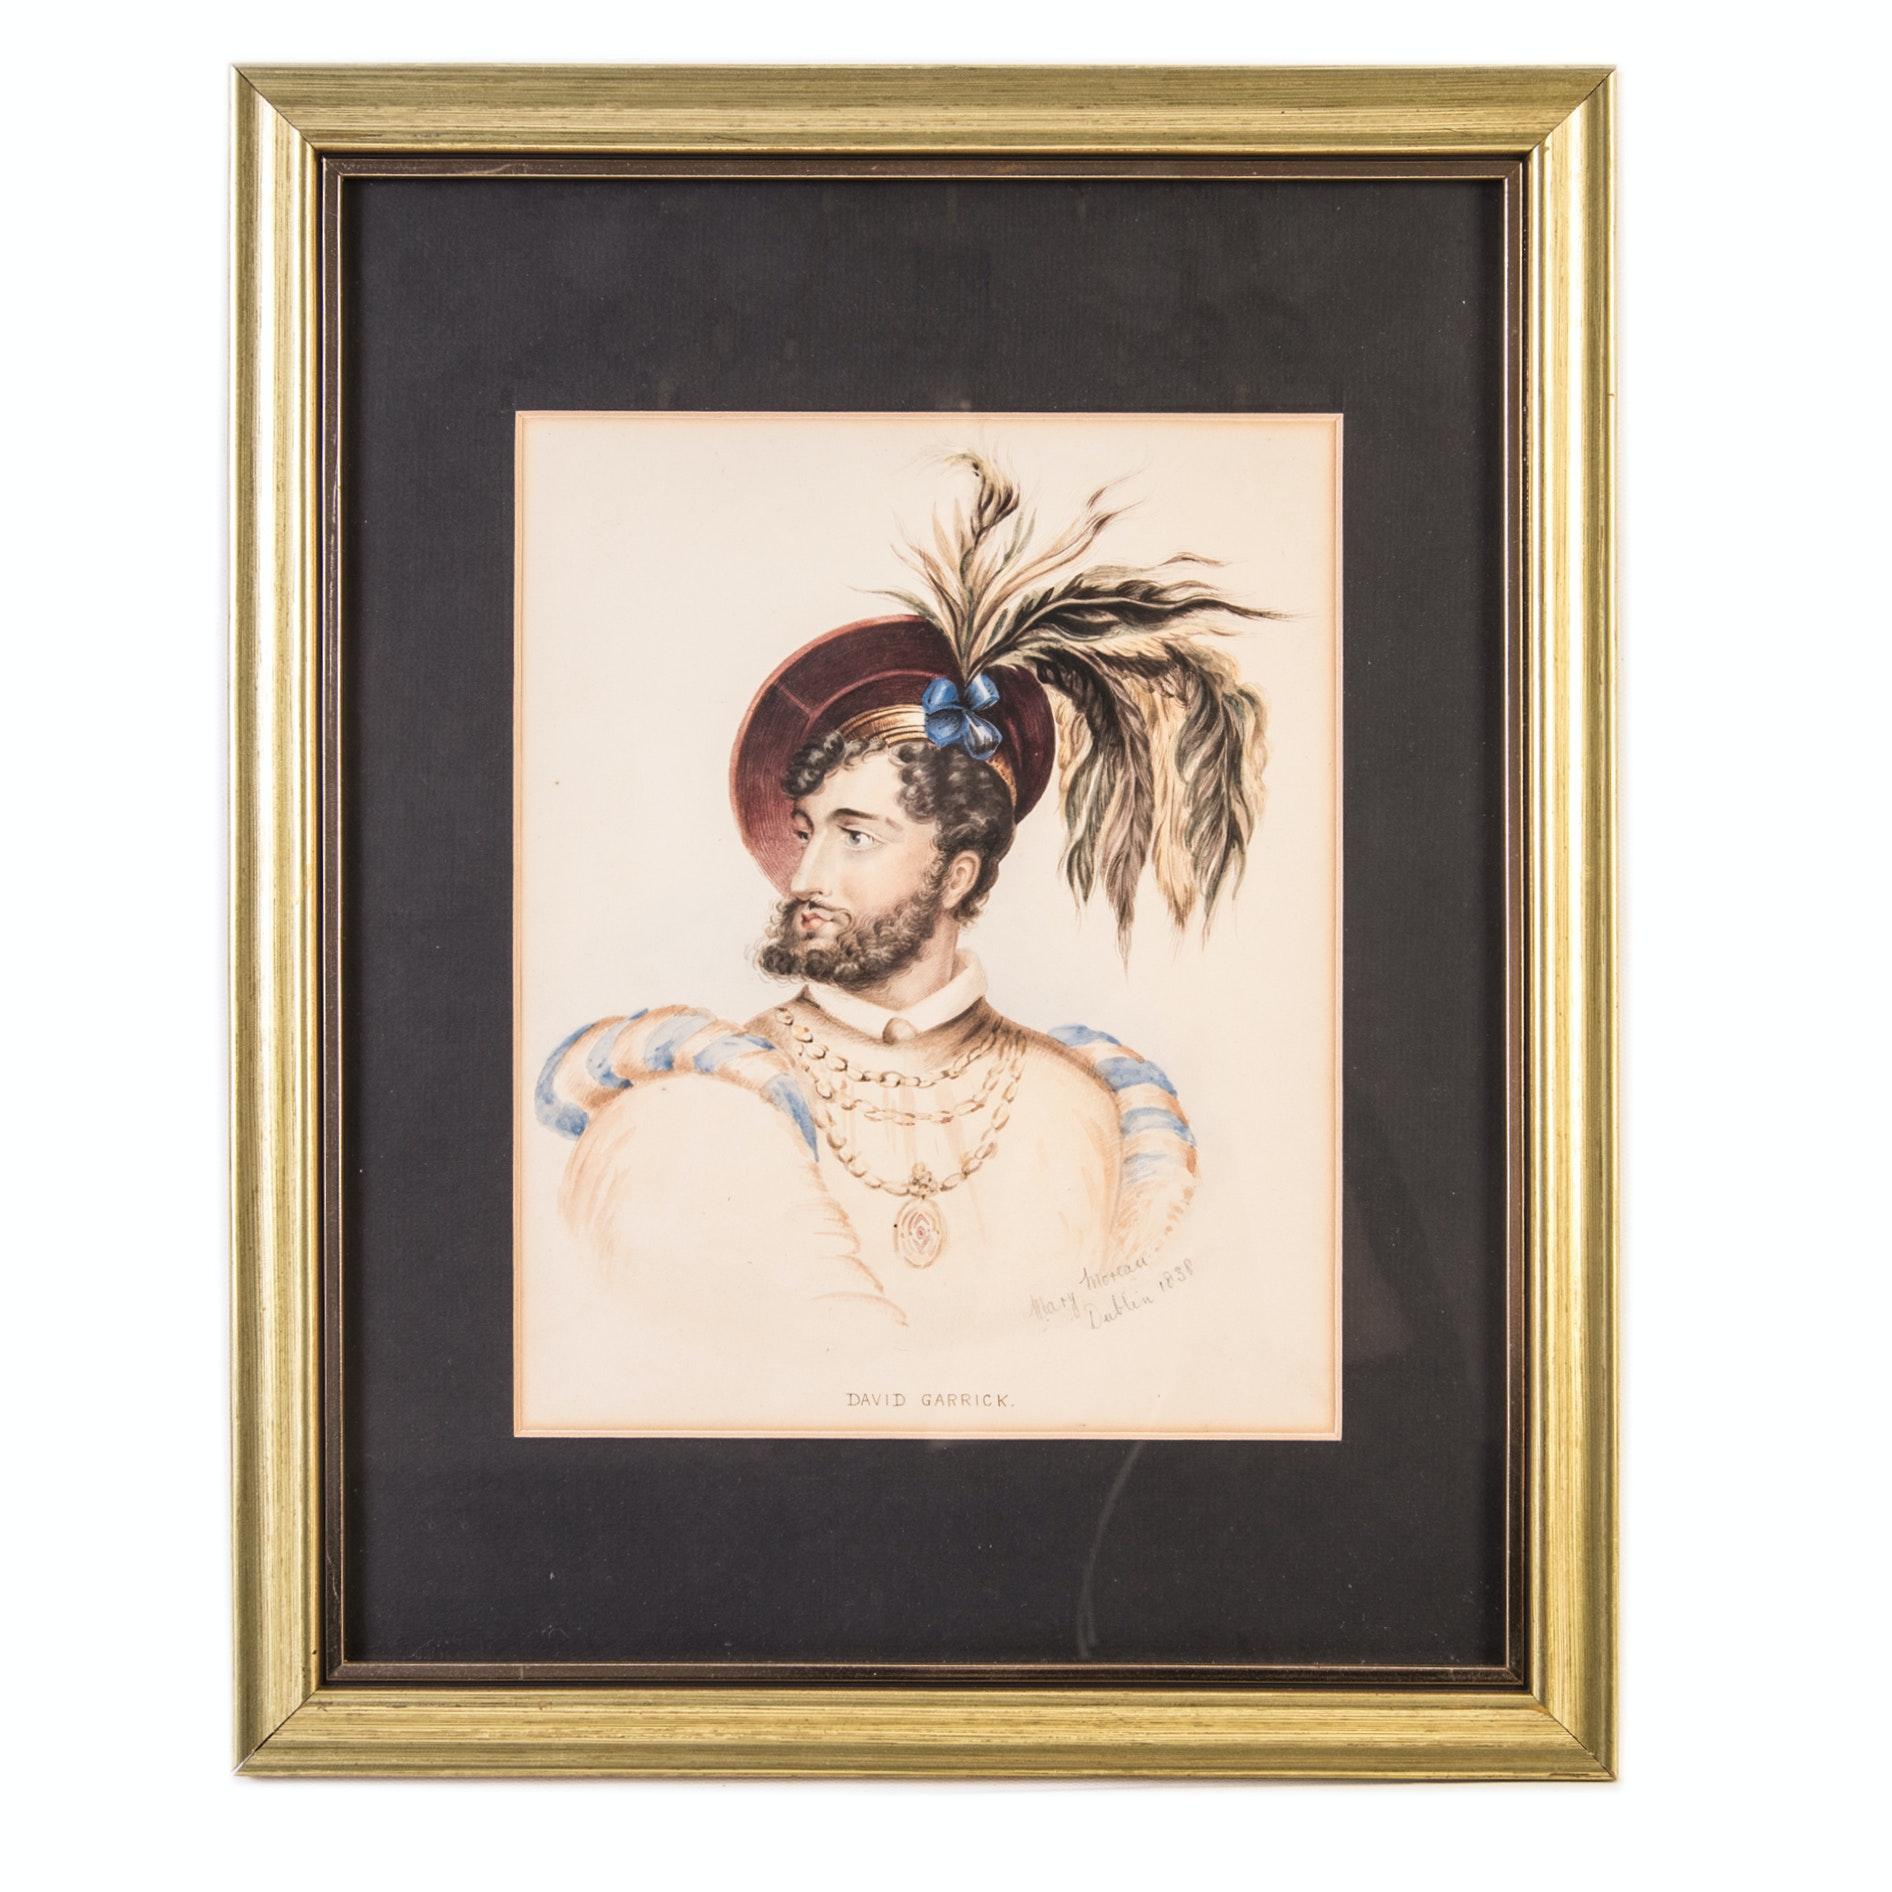 Antique Watercolor Portrait of David Garrick